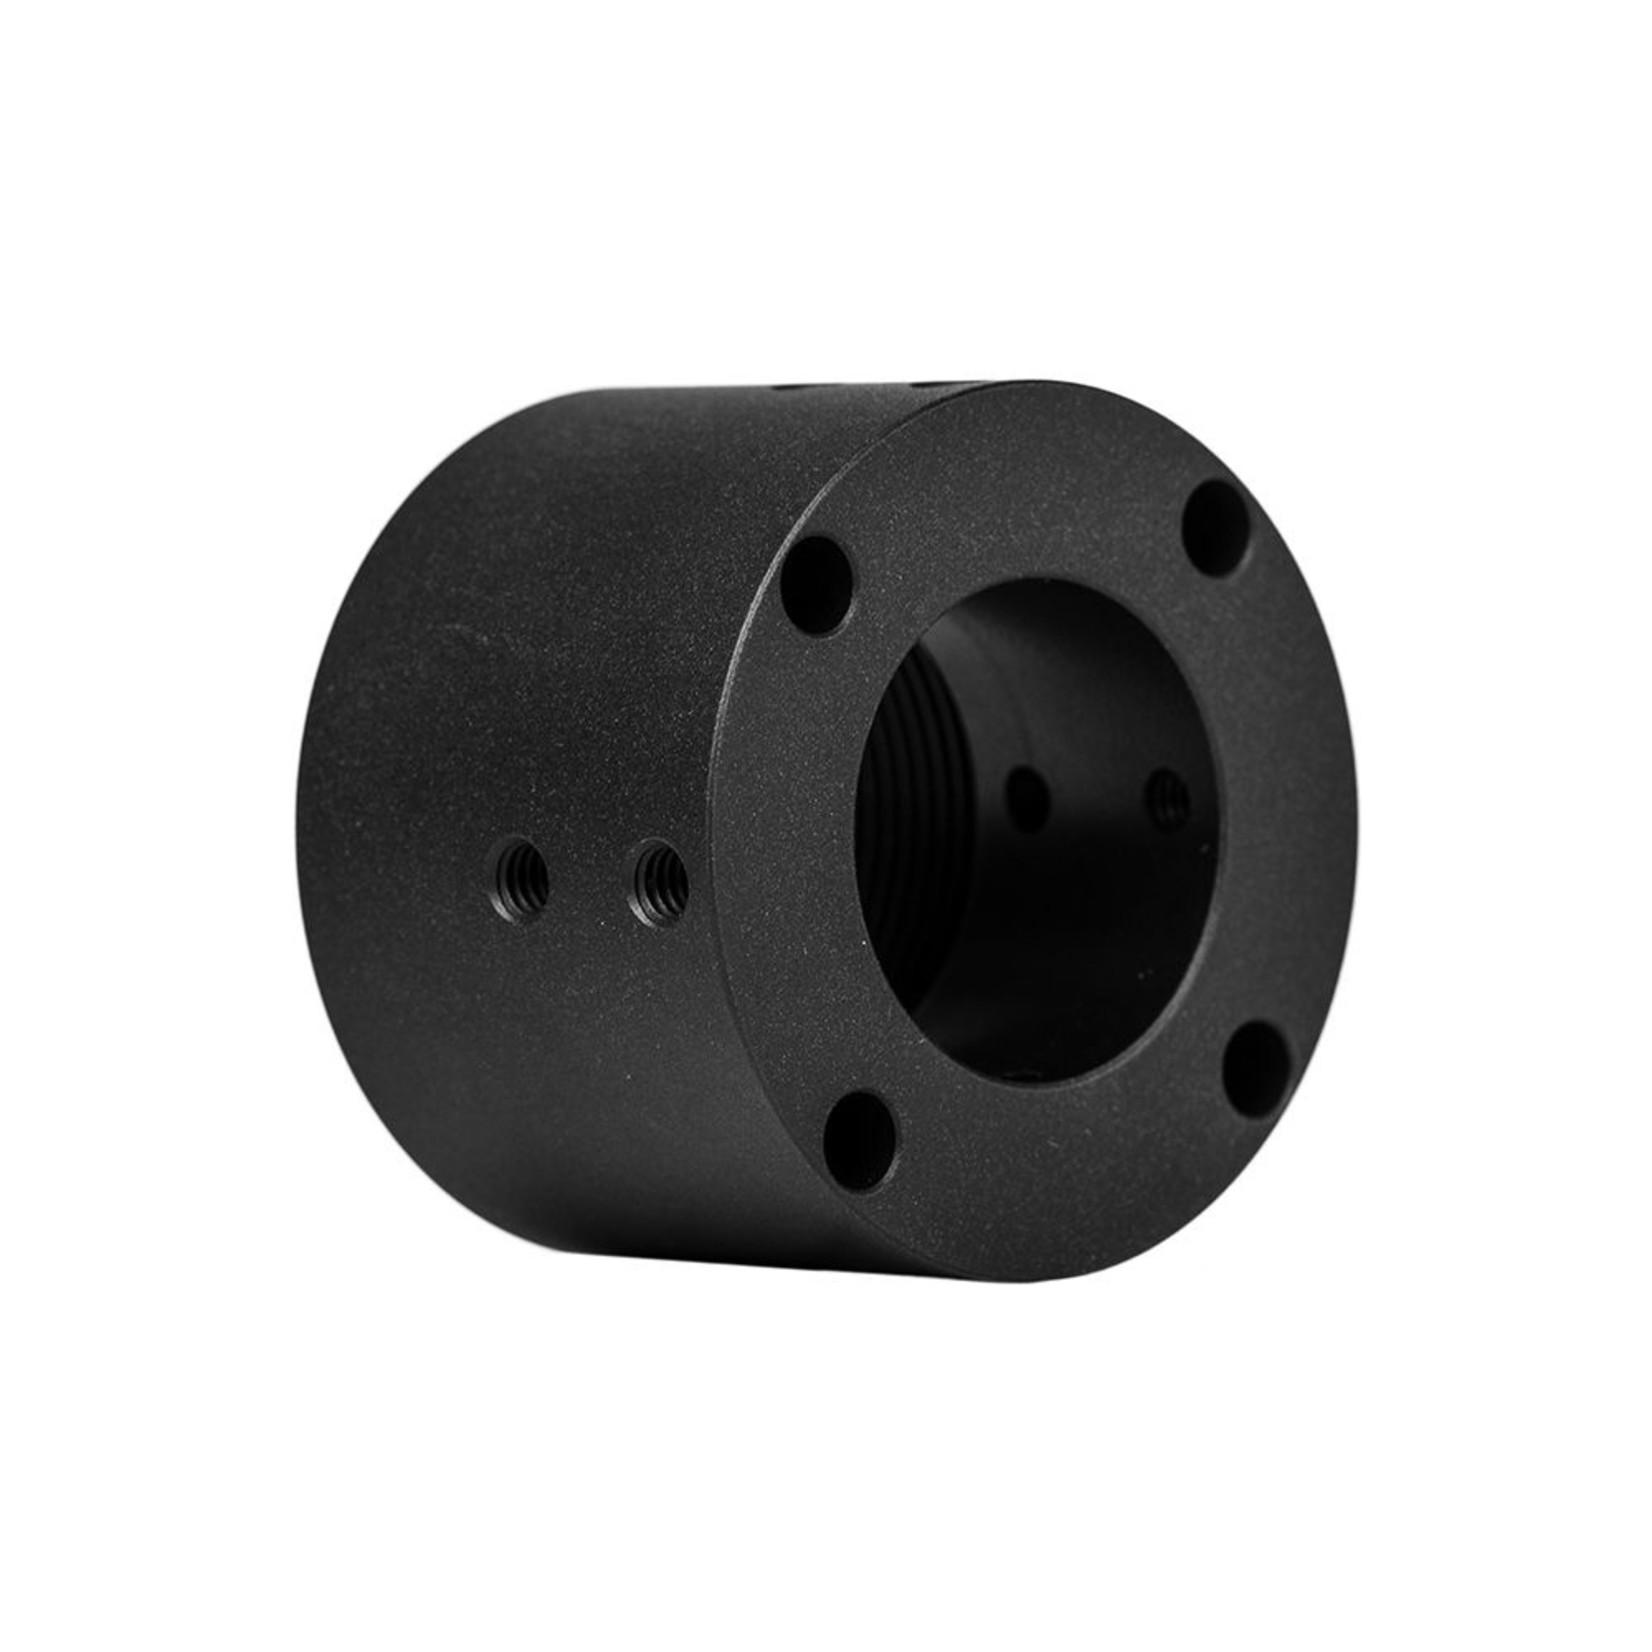 Aero BAR Nut adapter, Aero Precision